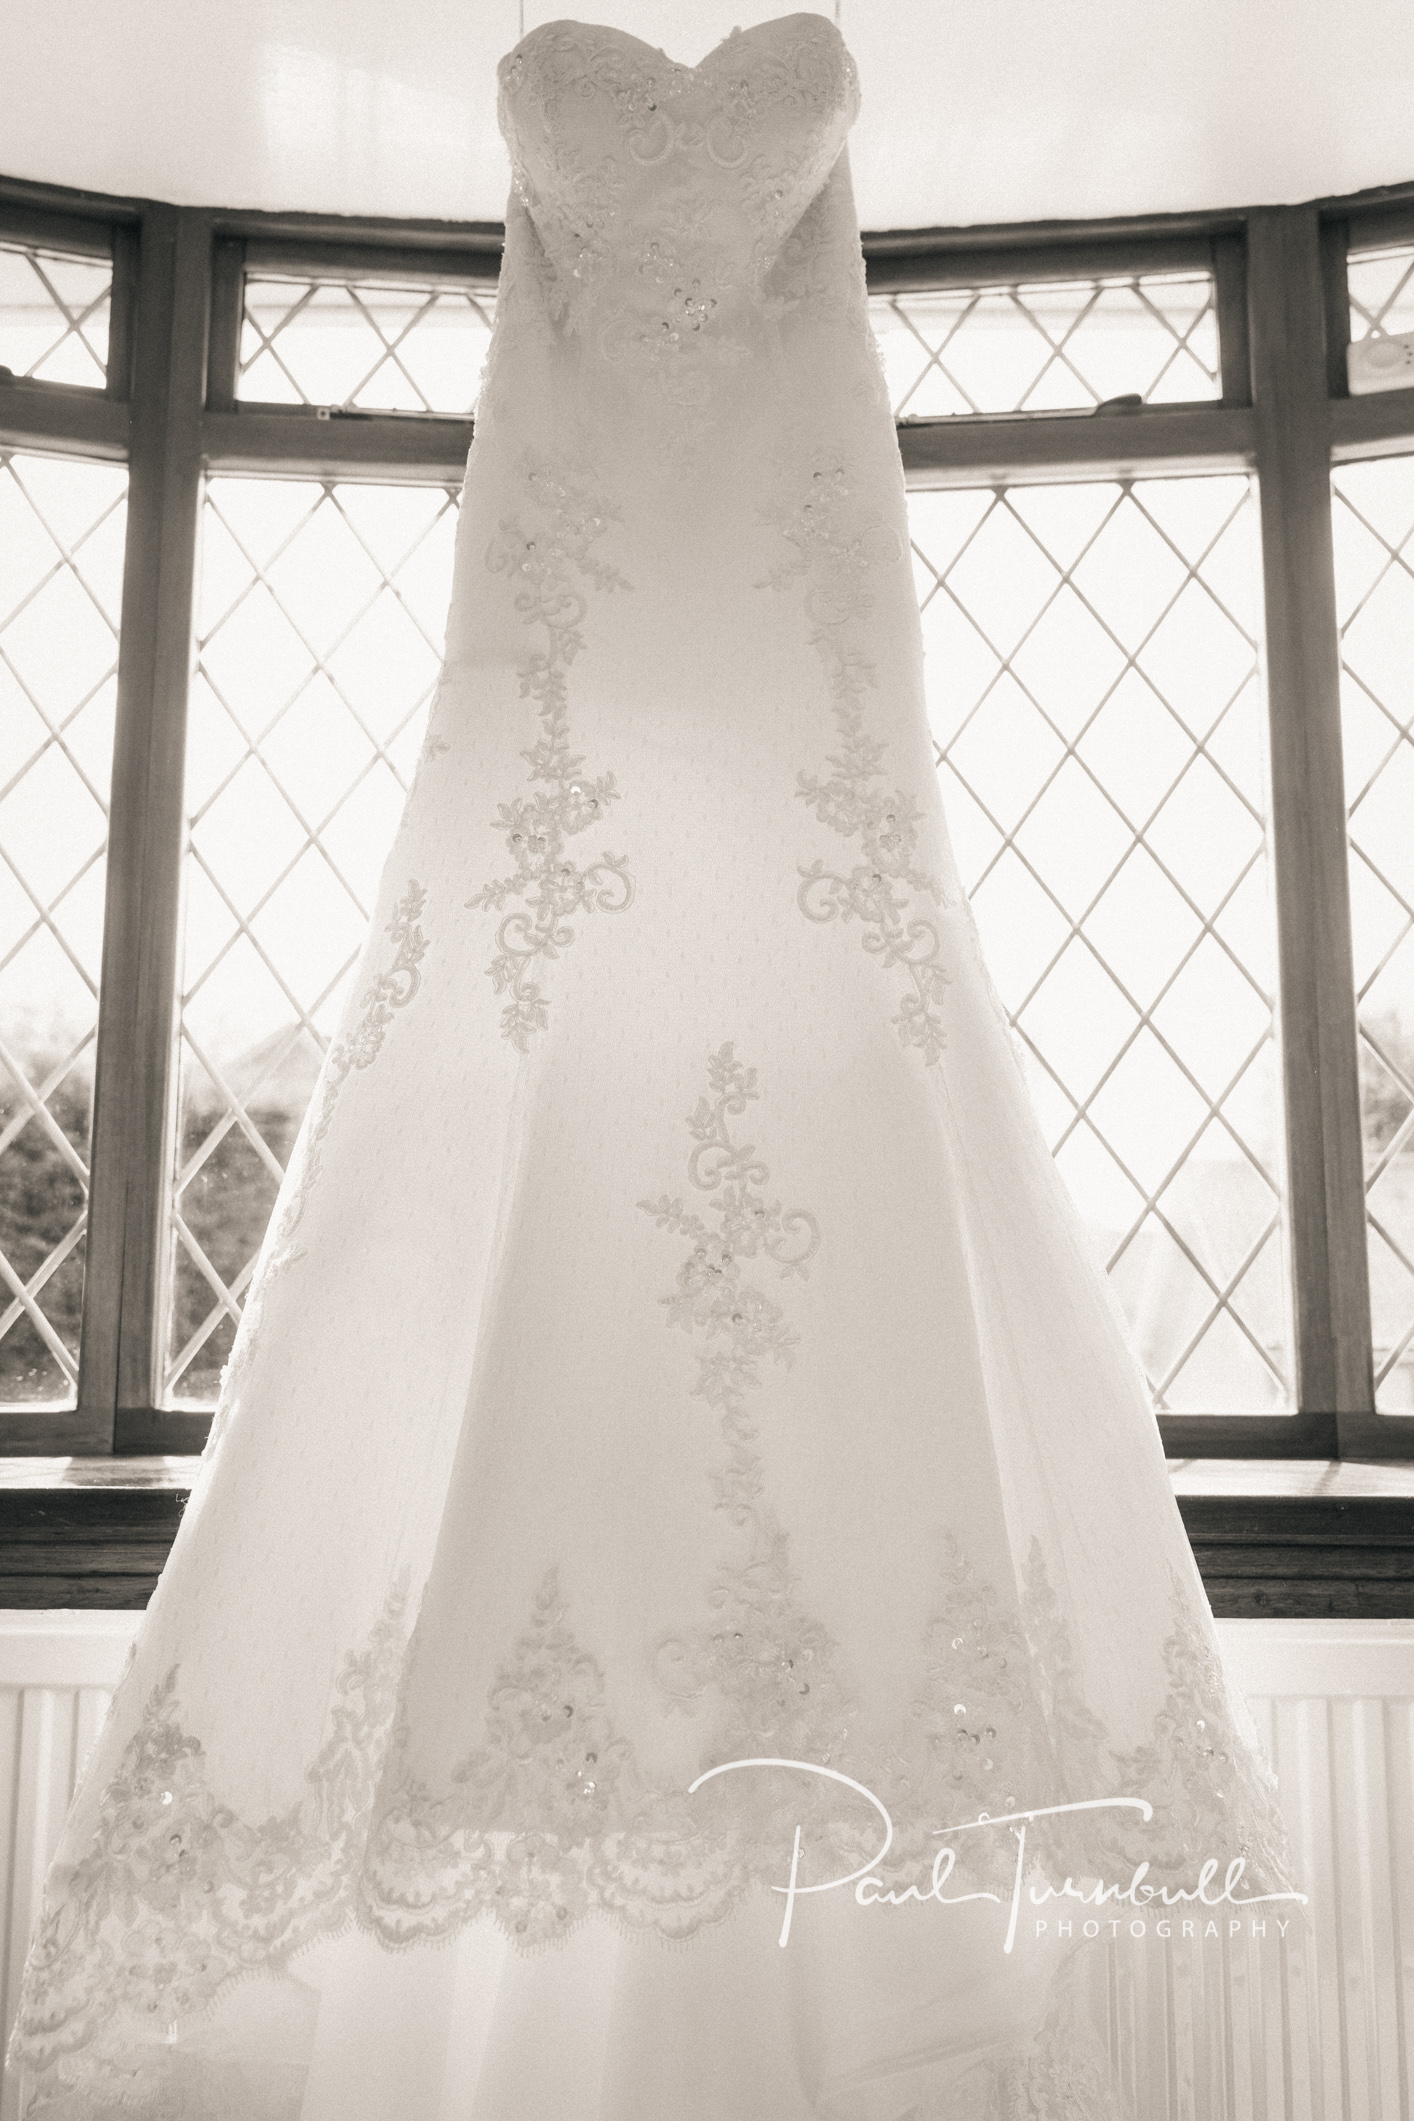 wedding-photographer-south-dalton-walkington-yorkshire-emma-james-012.jpg